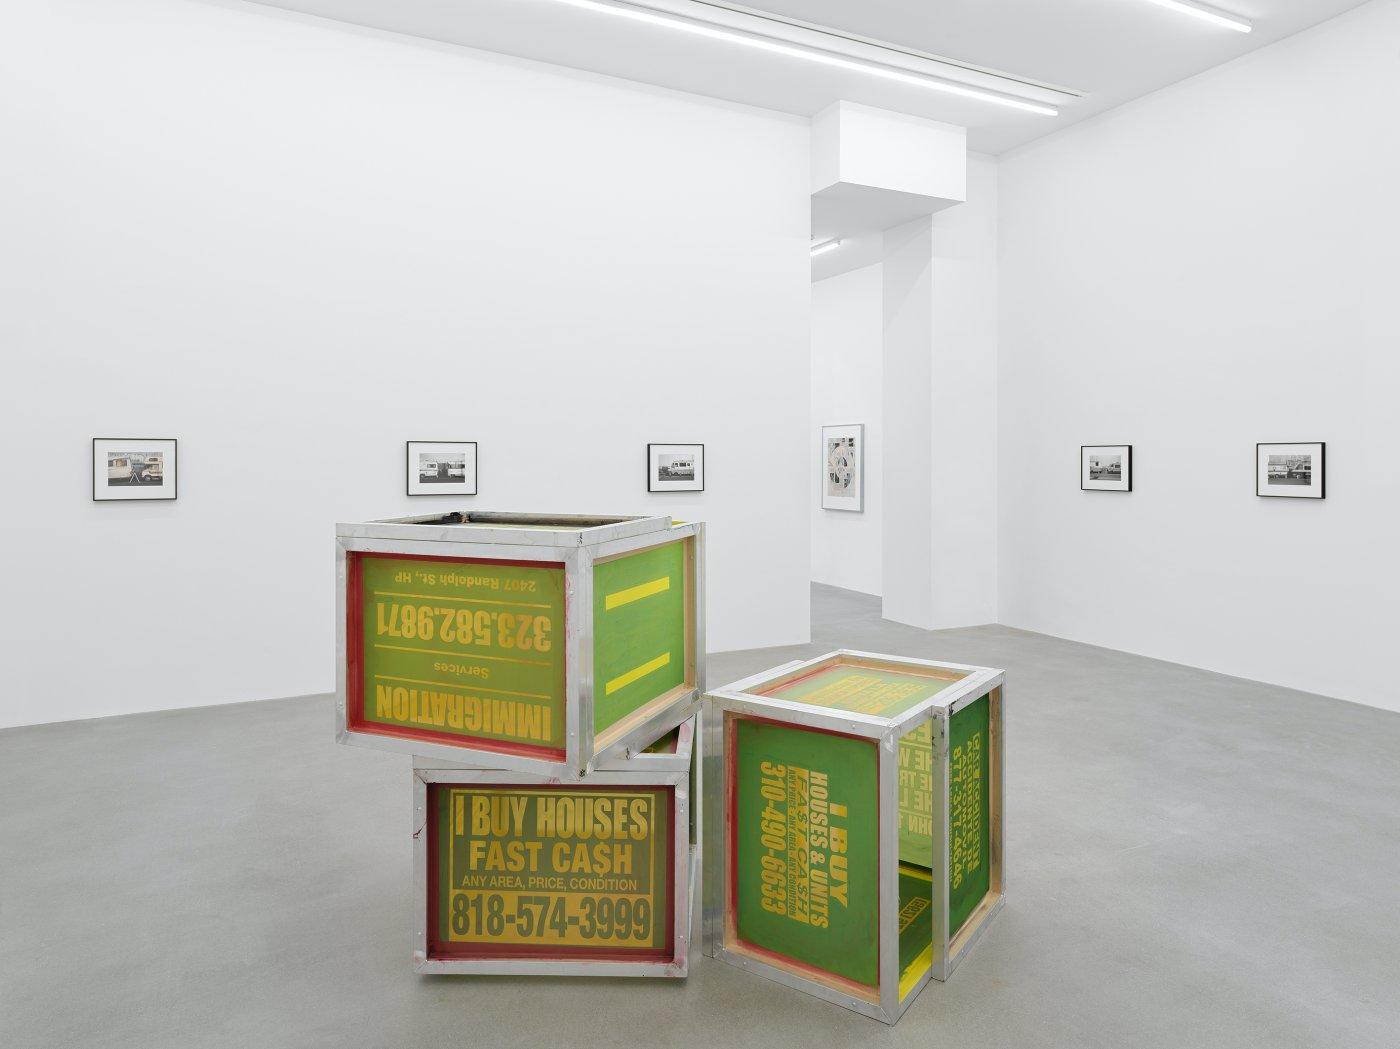 Galerie Eva Presenhuber Waldmanstrasse Walead Beshty 9